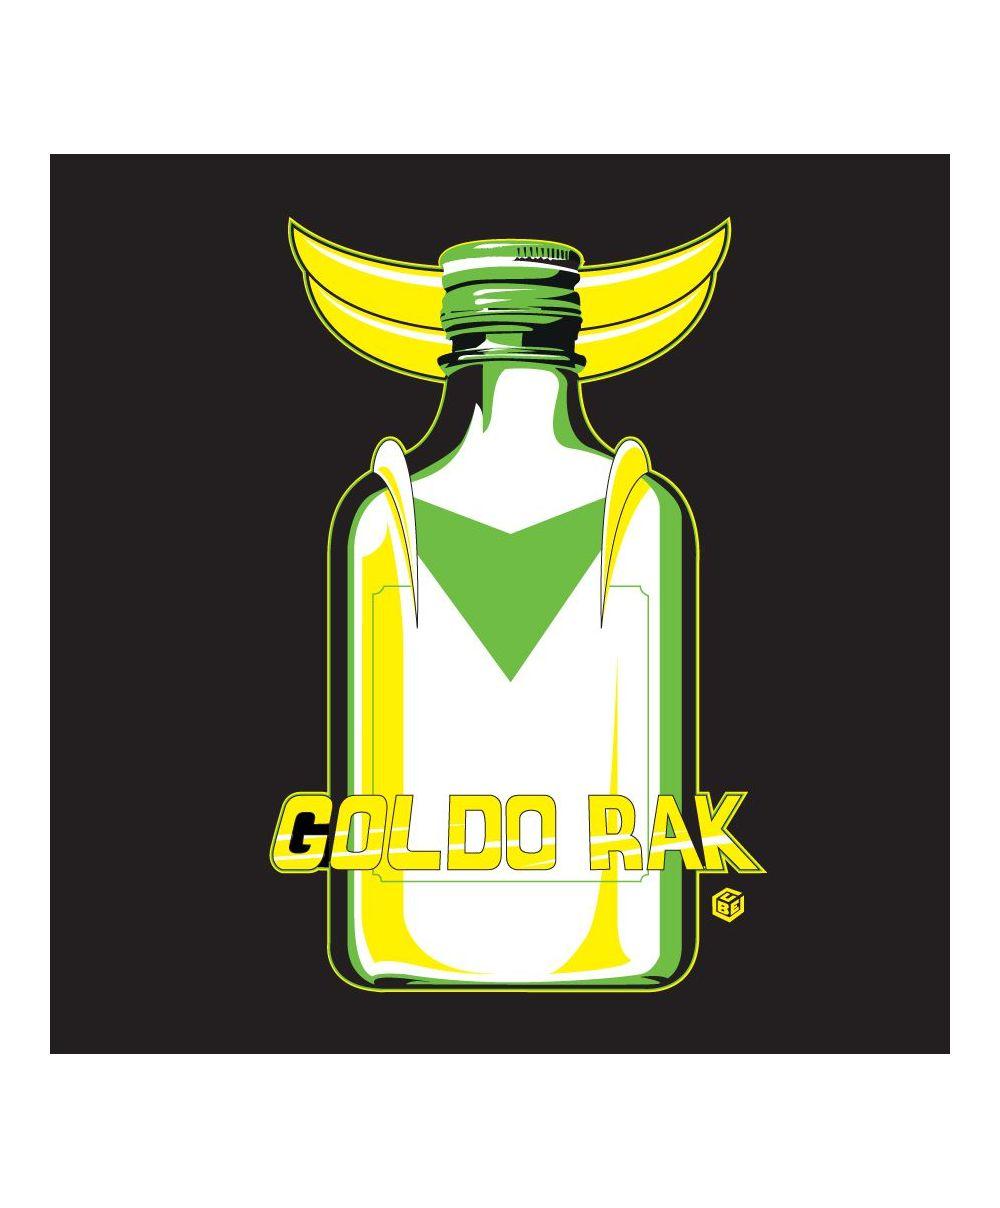 Gold Rak